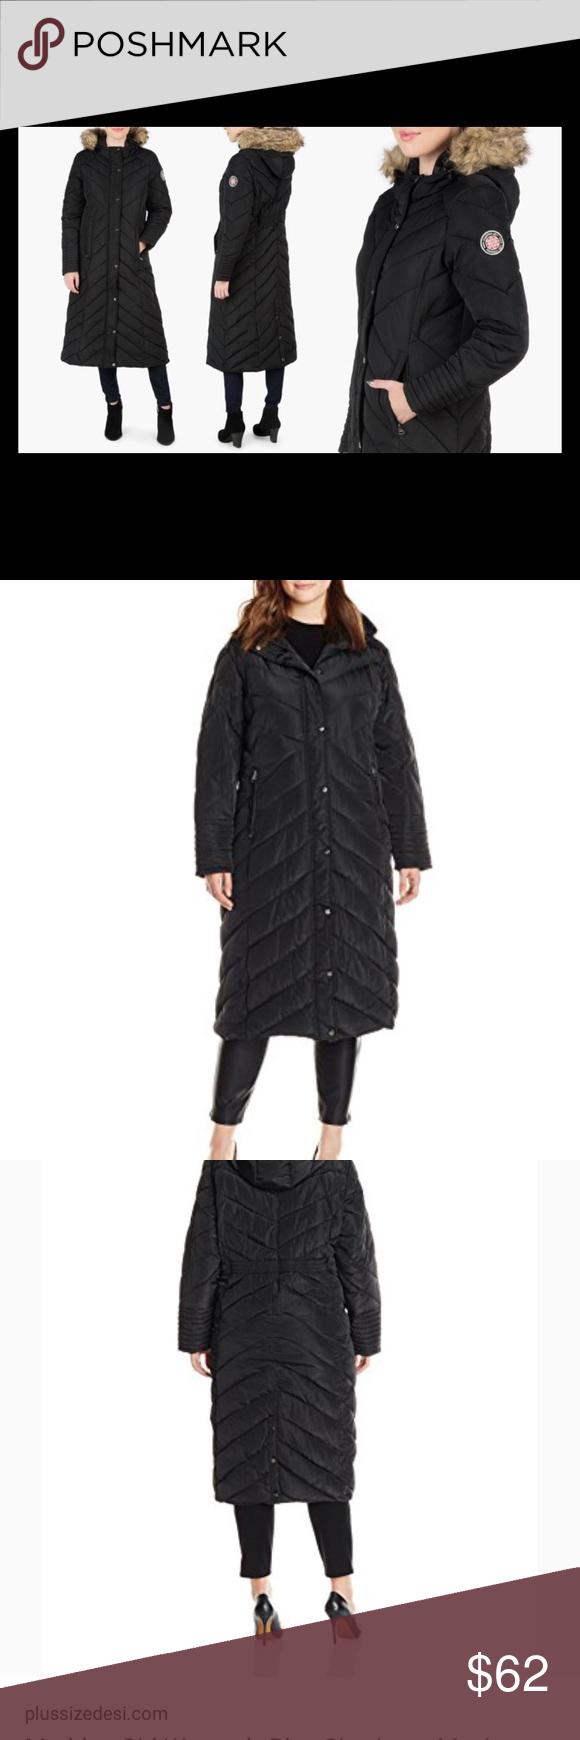 9676a1697db80 Madden Girl Plus-Size Long Maxi Puffer Coat